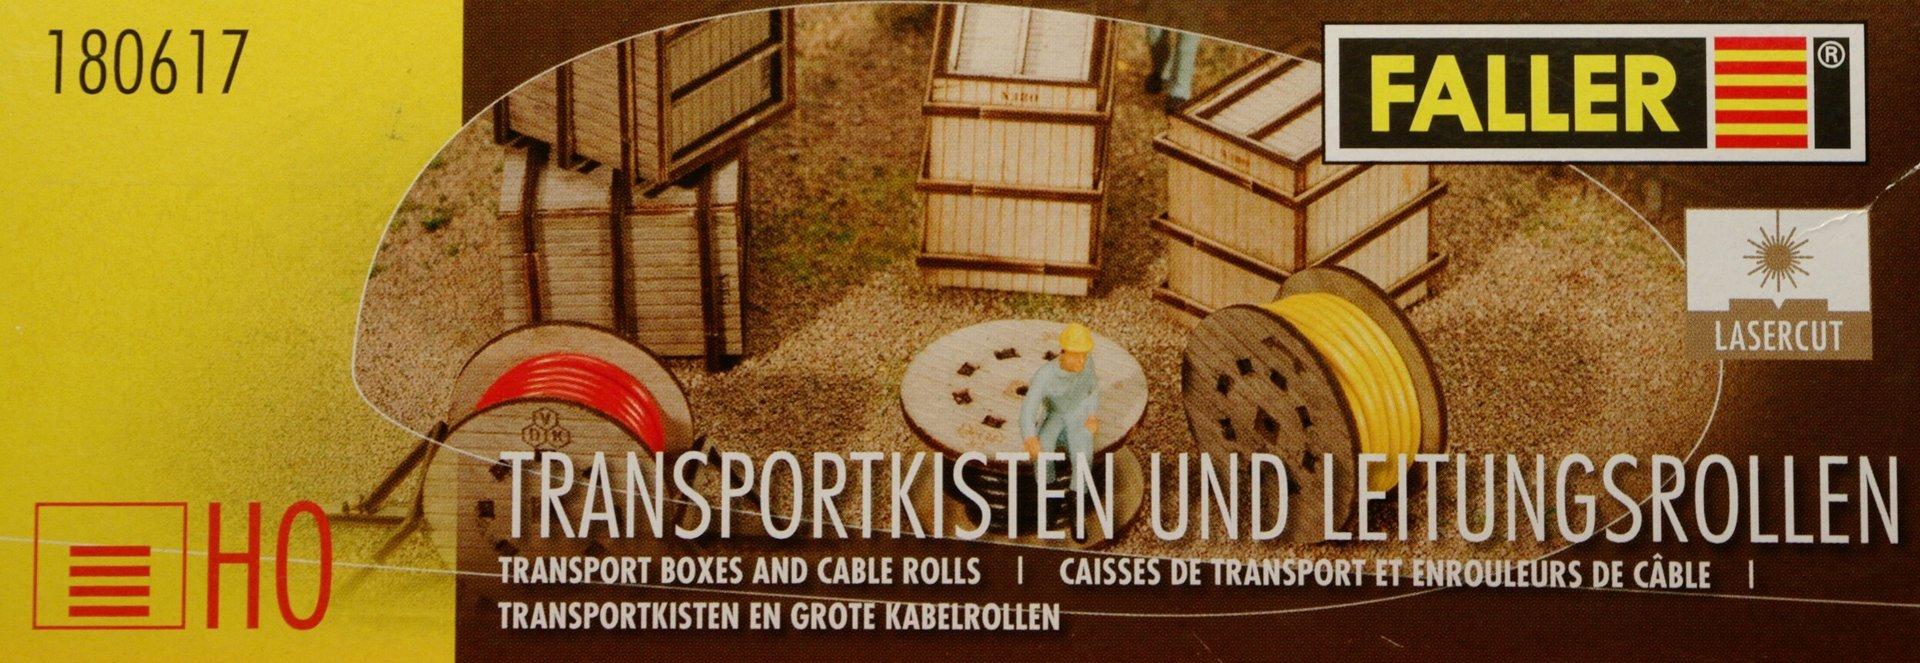 Faller 180617 Transportkisten und Leitungsrollen